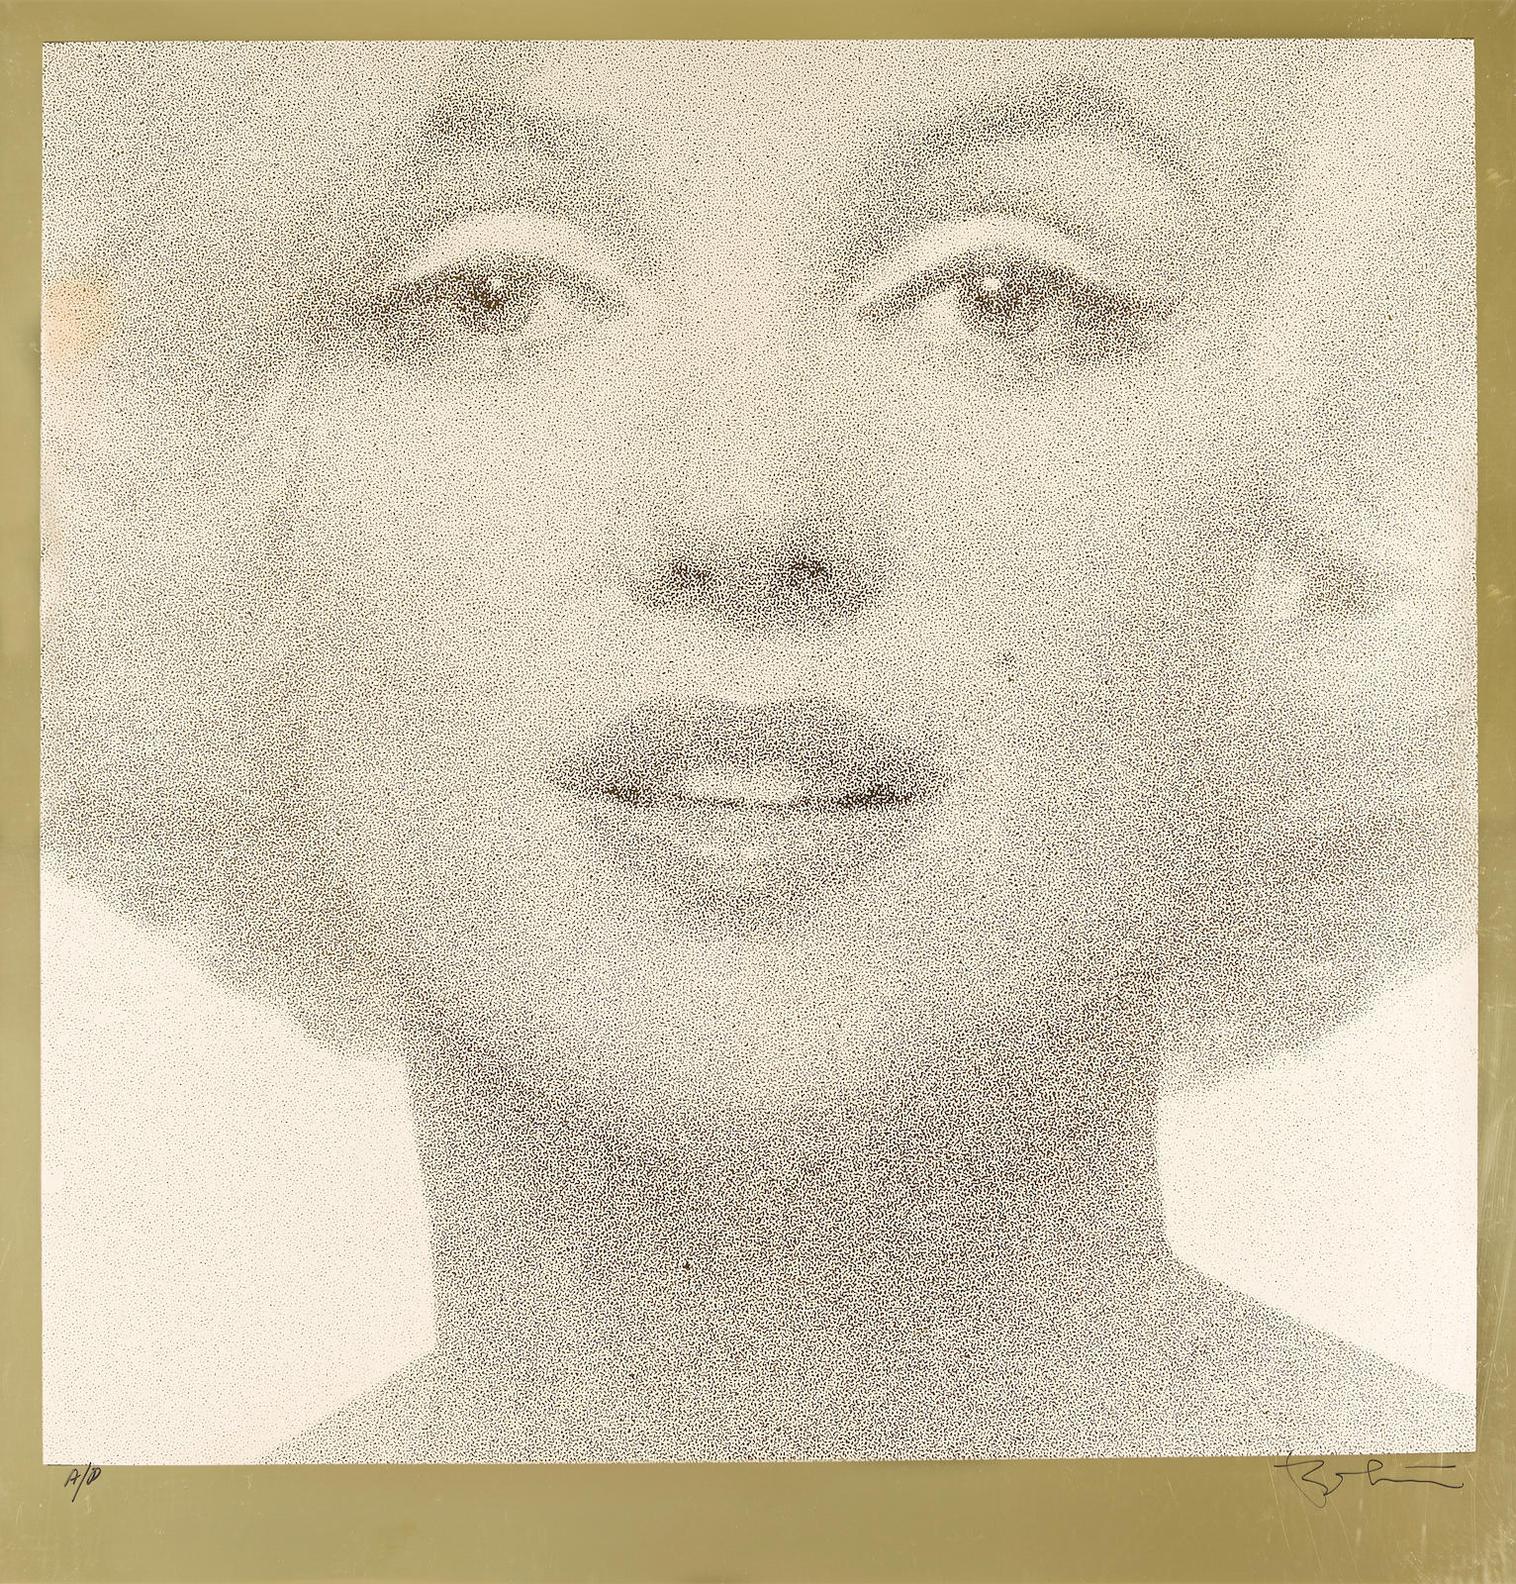 Bert Stern-Head Shot (Creme On Gold)-1962